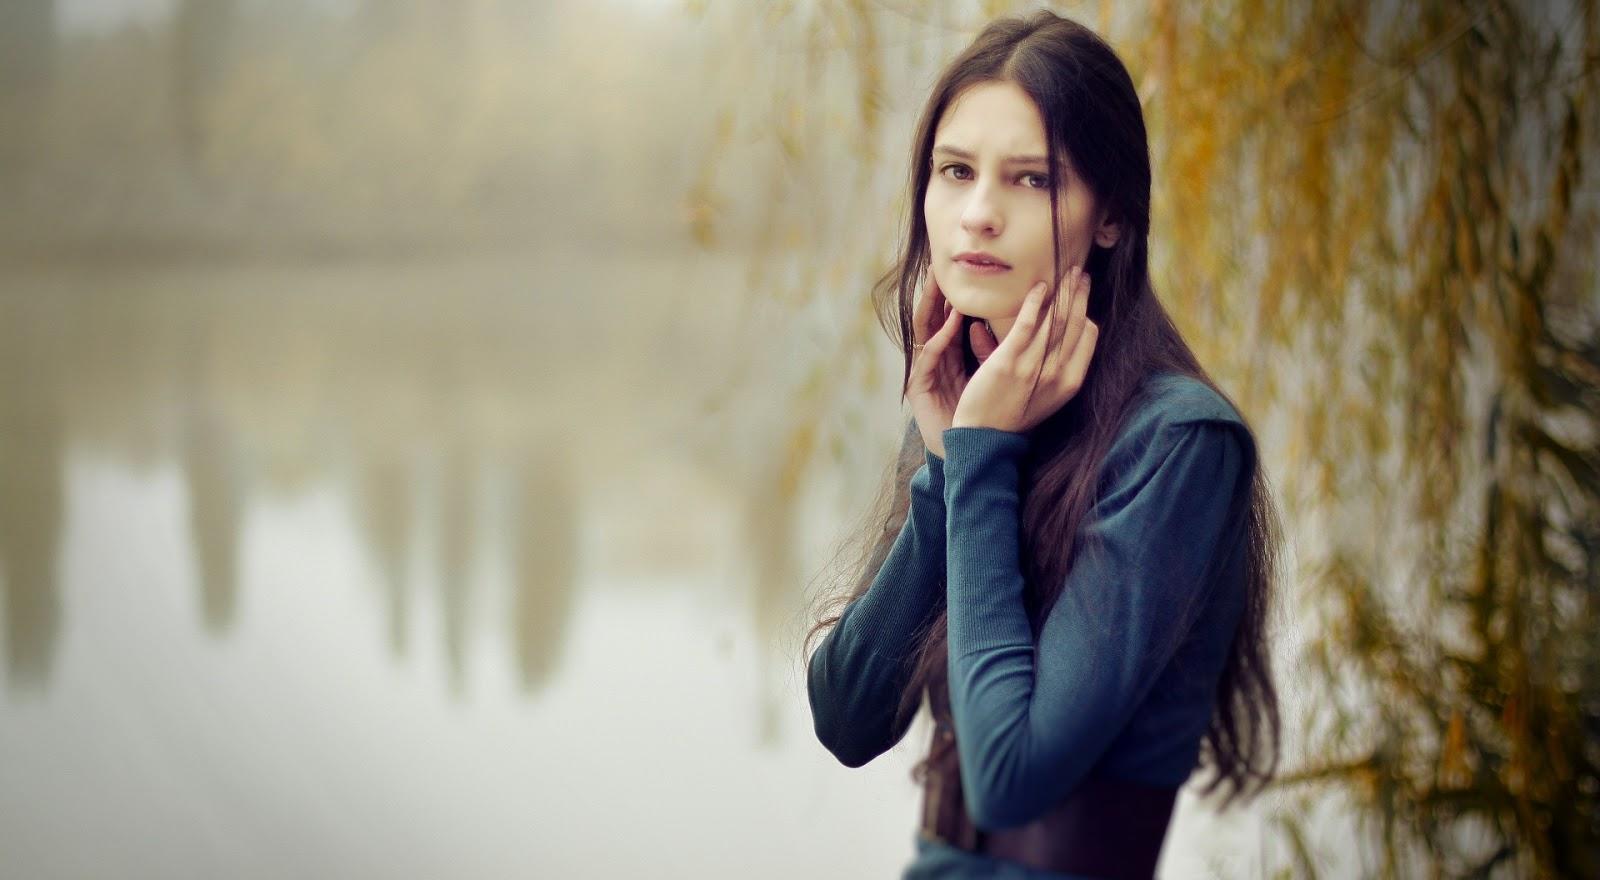 Beautiful Girls Hd Wallpapers Download 1080p Ultra Hd